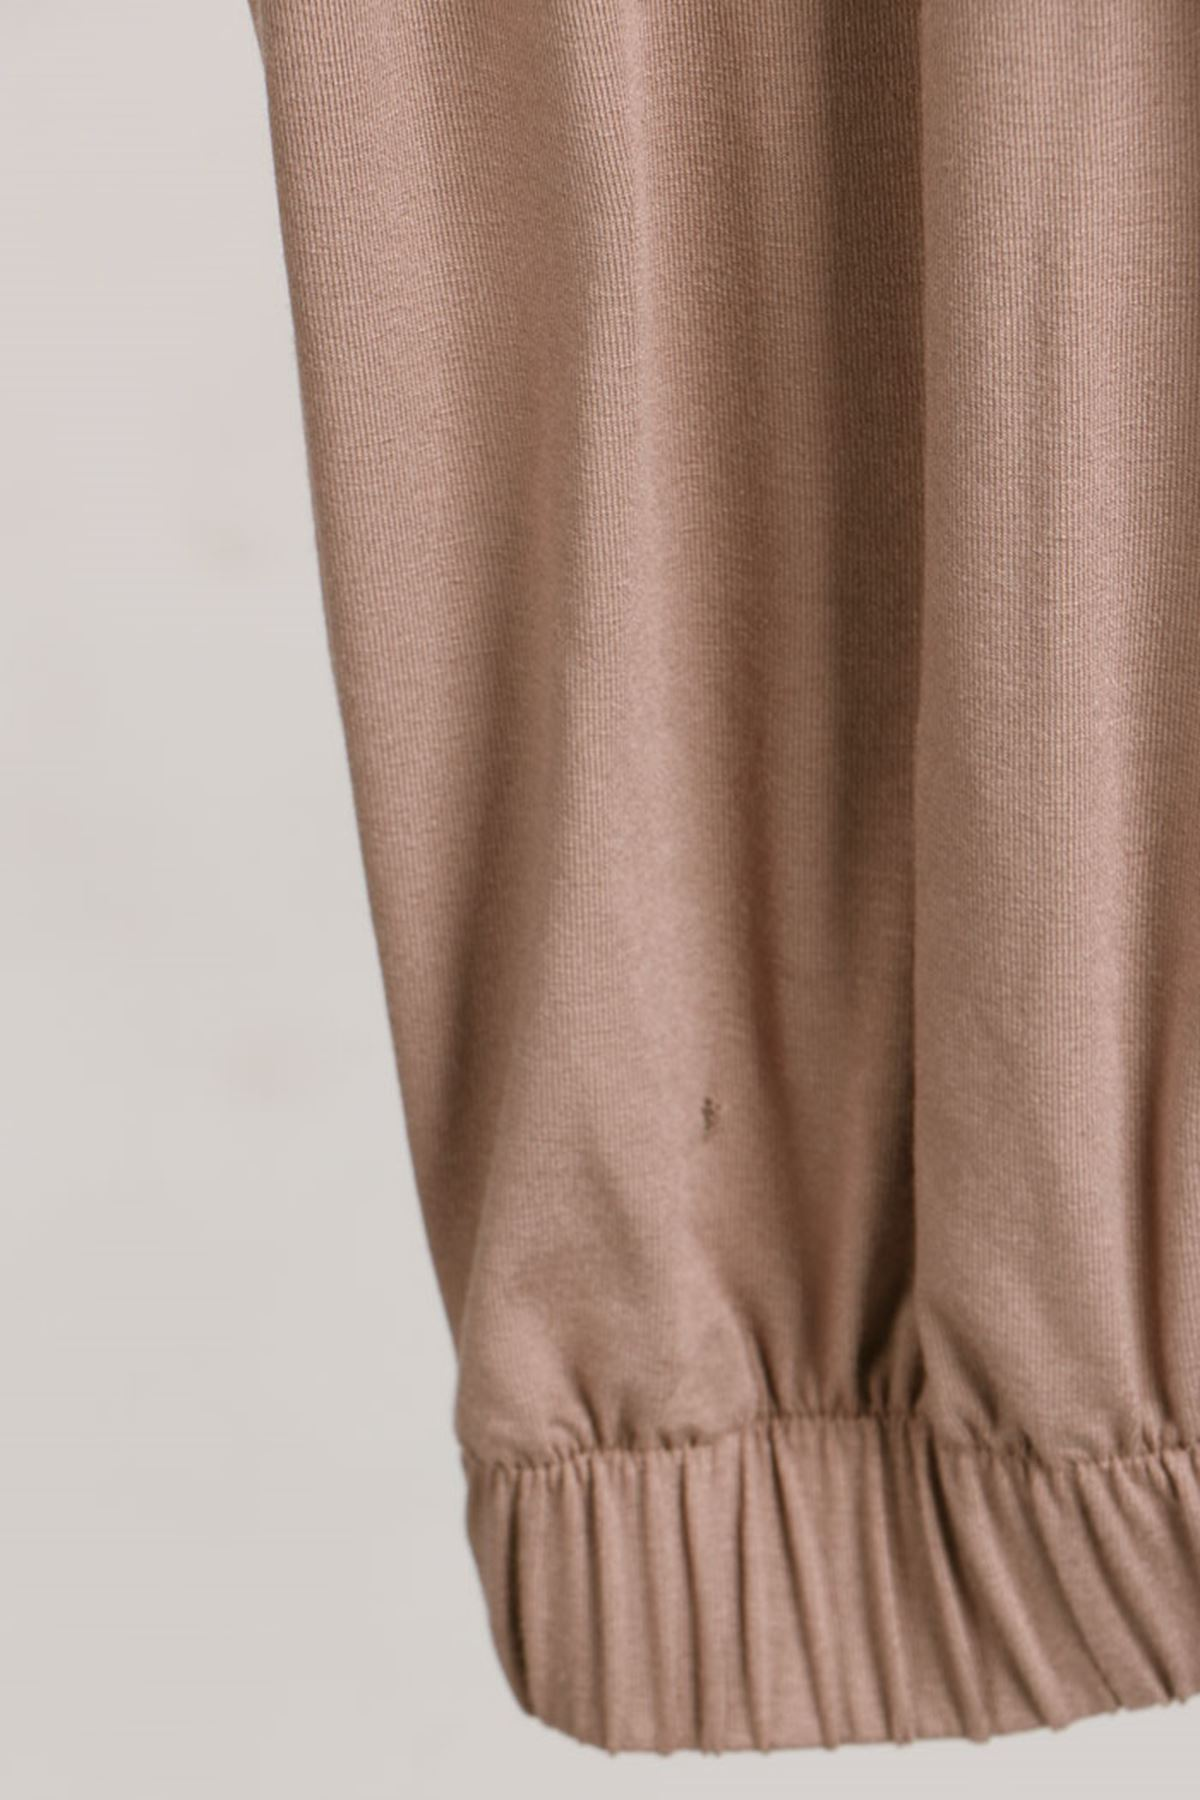 D-9150 Büyük Beden Defolu Lastikli Penye Pantolon - Vizon